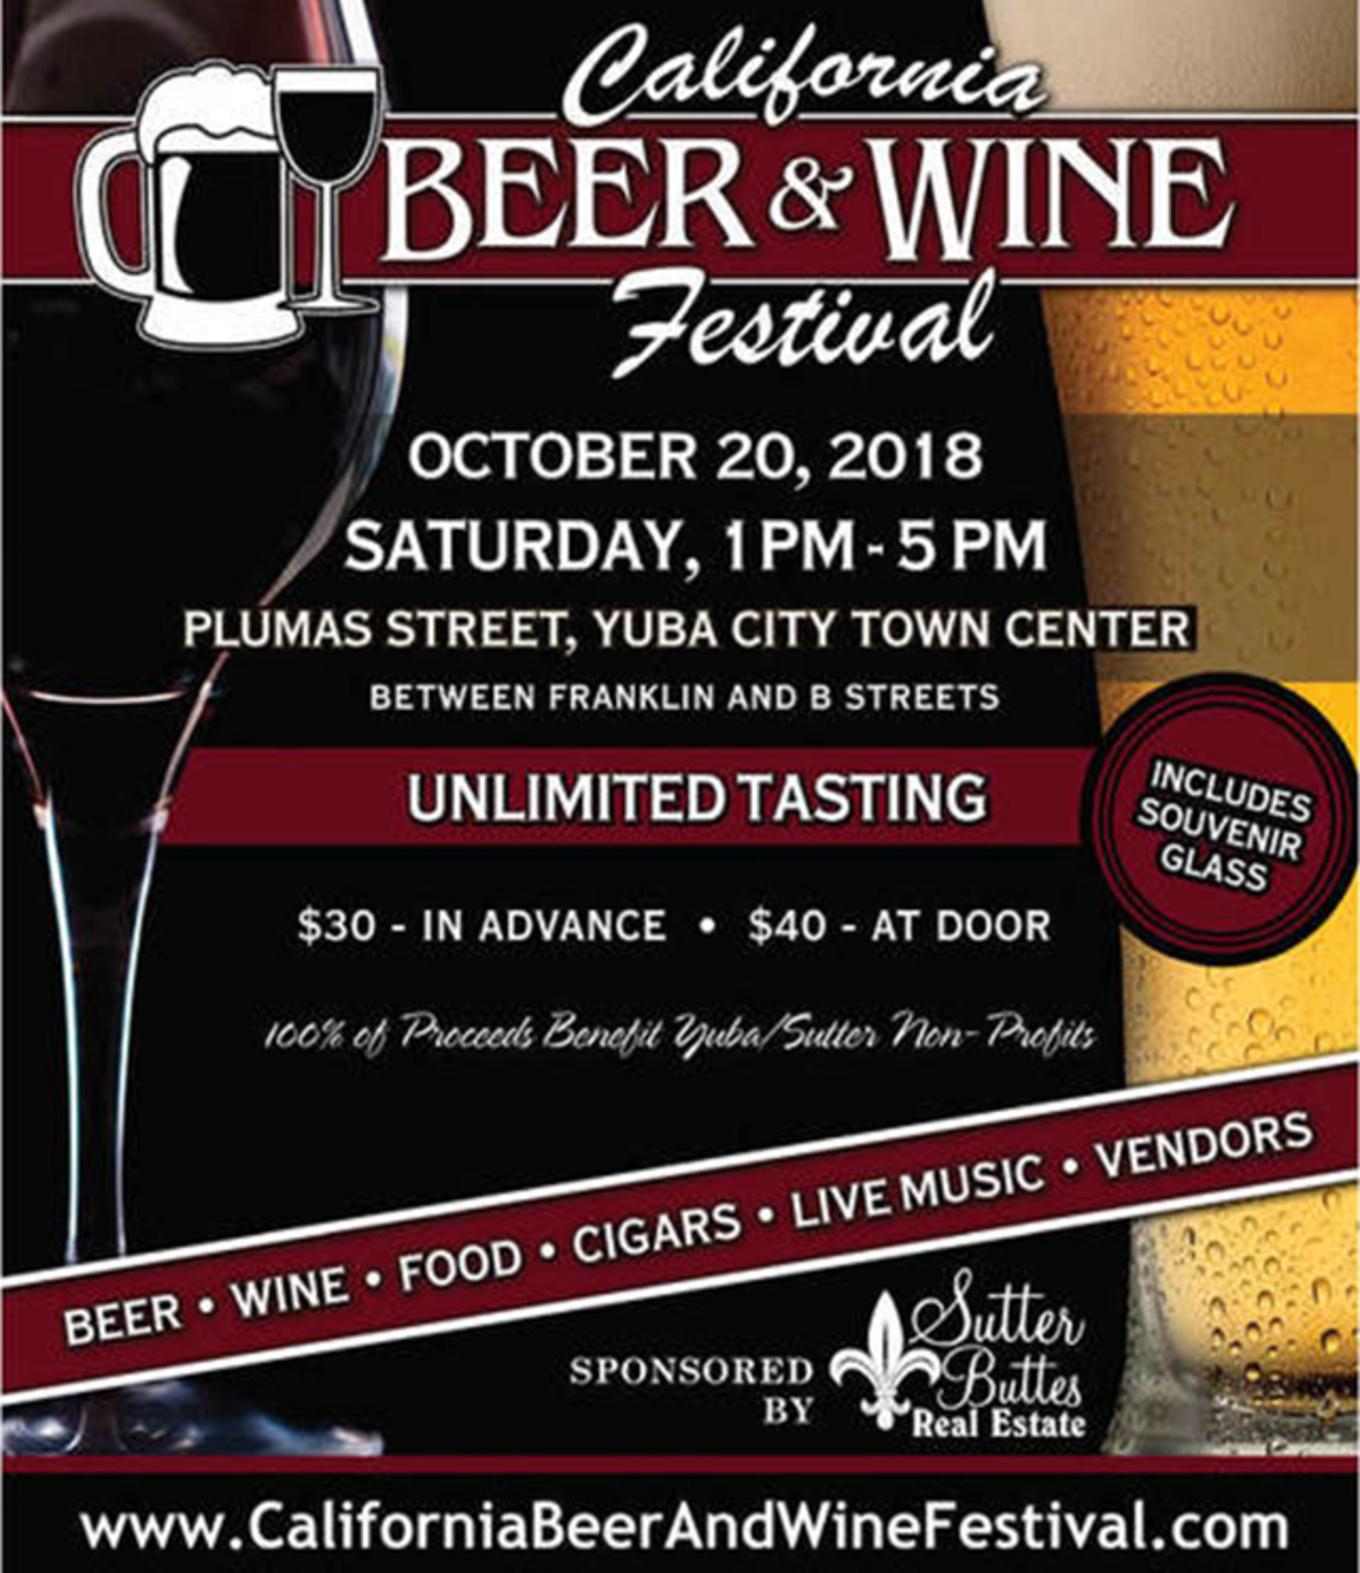 California Beer & Wine Festival - Tickets - Yuba City Town